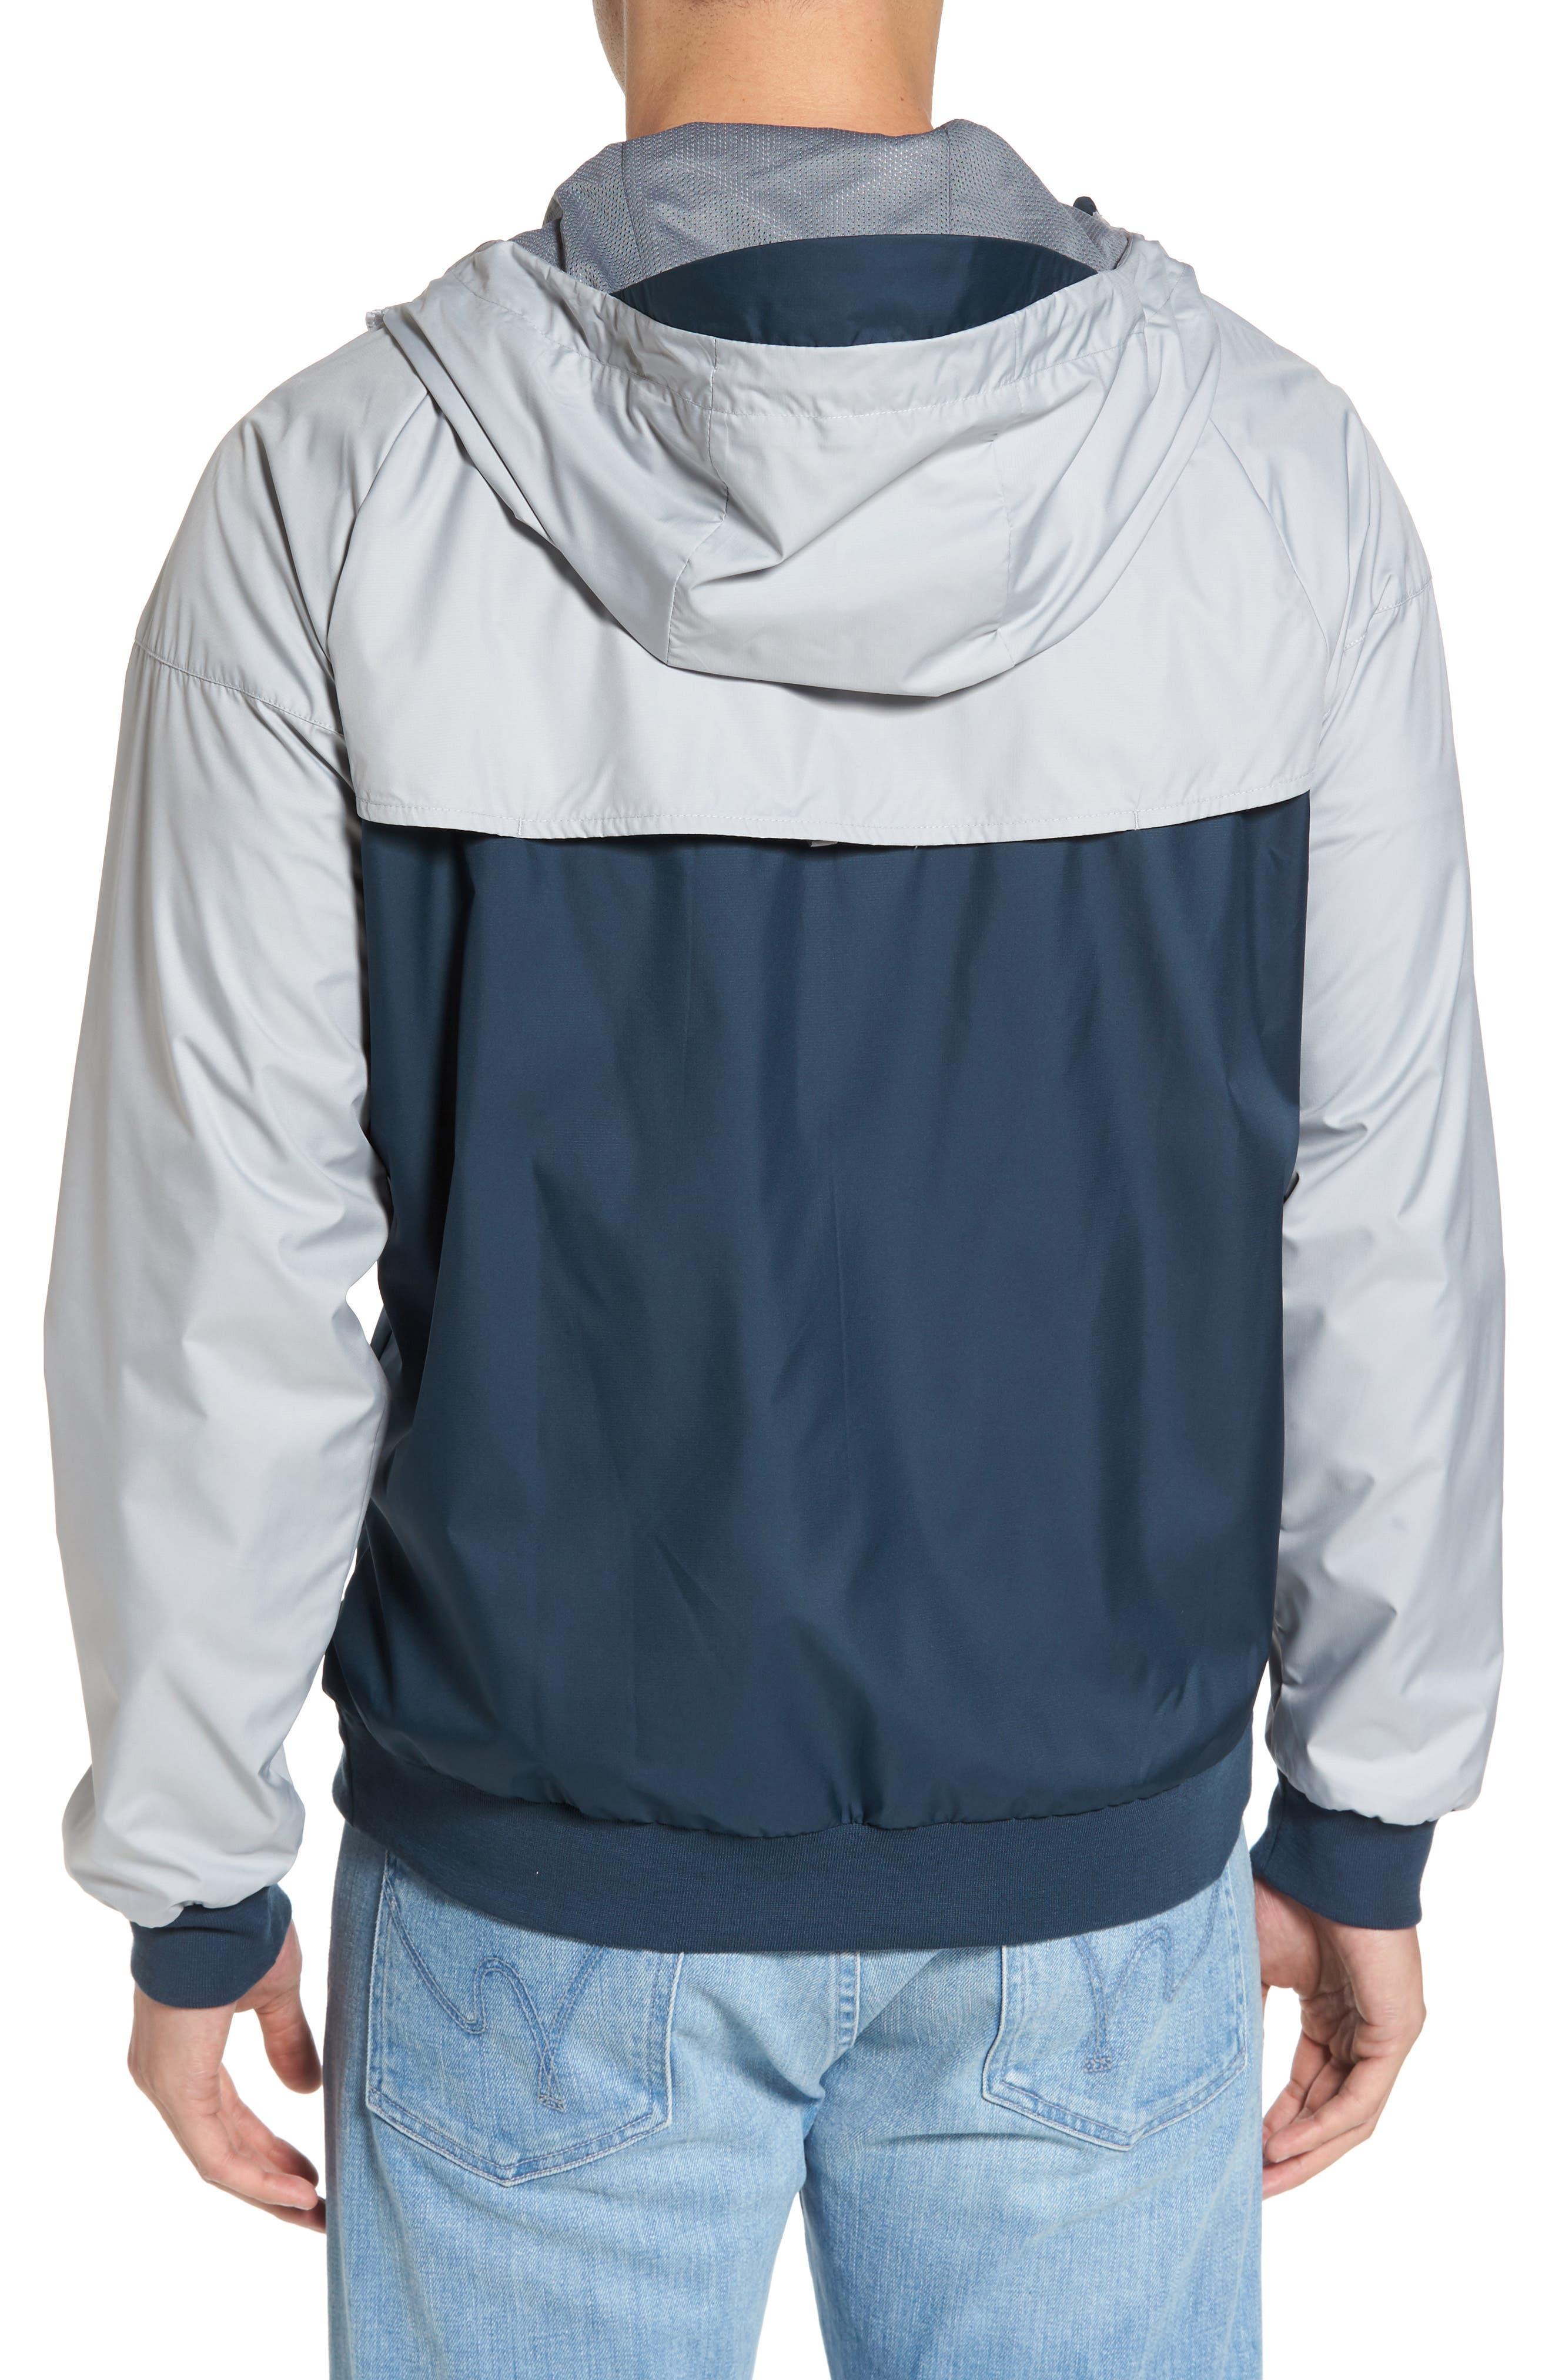 'Windrunner' Colorblock Jacket,                             Alternate thumbnail 2, color,                             GREY/ BLUE